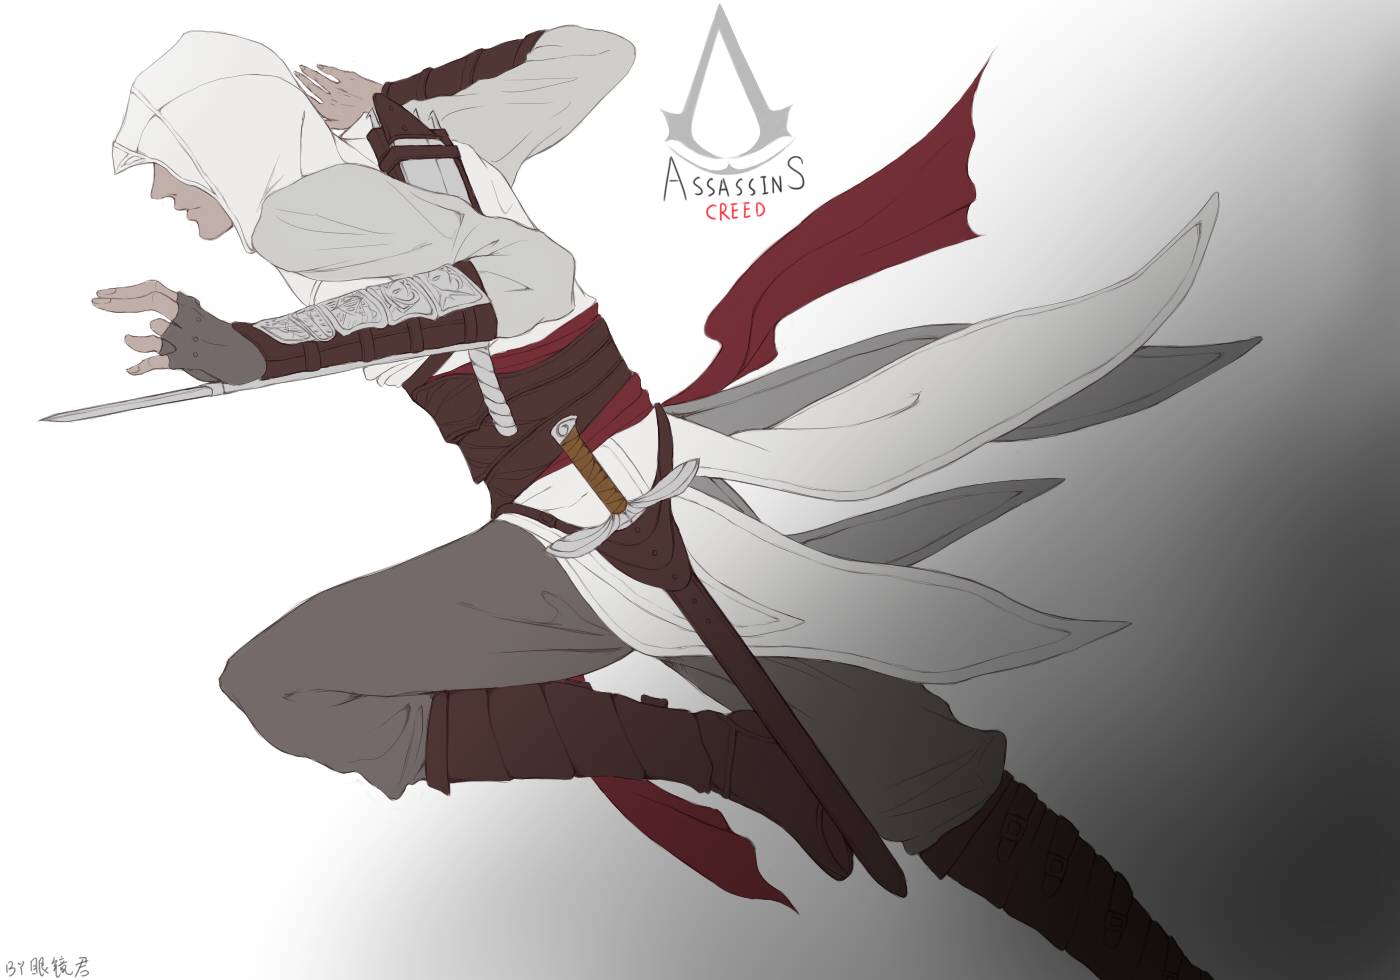 Altair Ibn La Ahad Assassin S Creed Image 986066 Zerochan